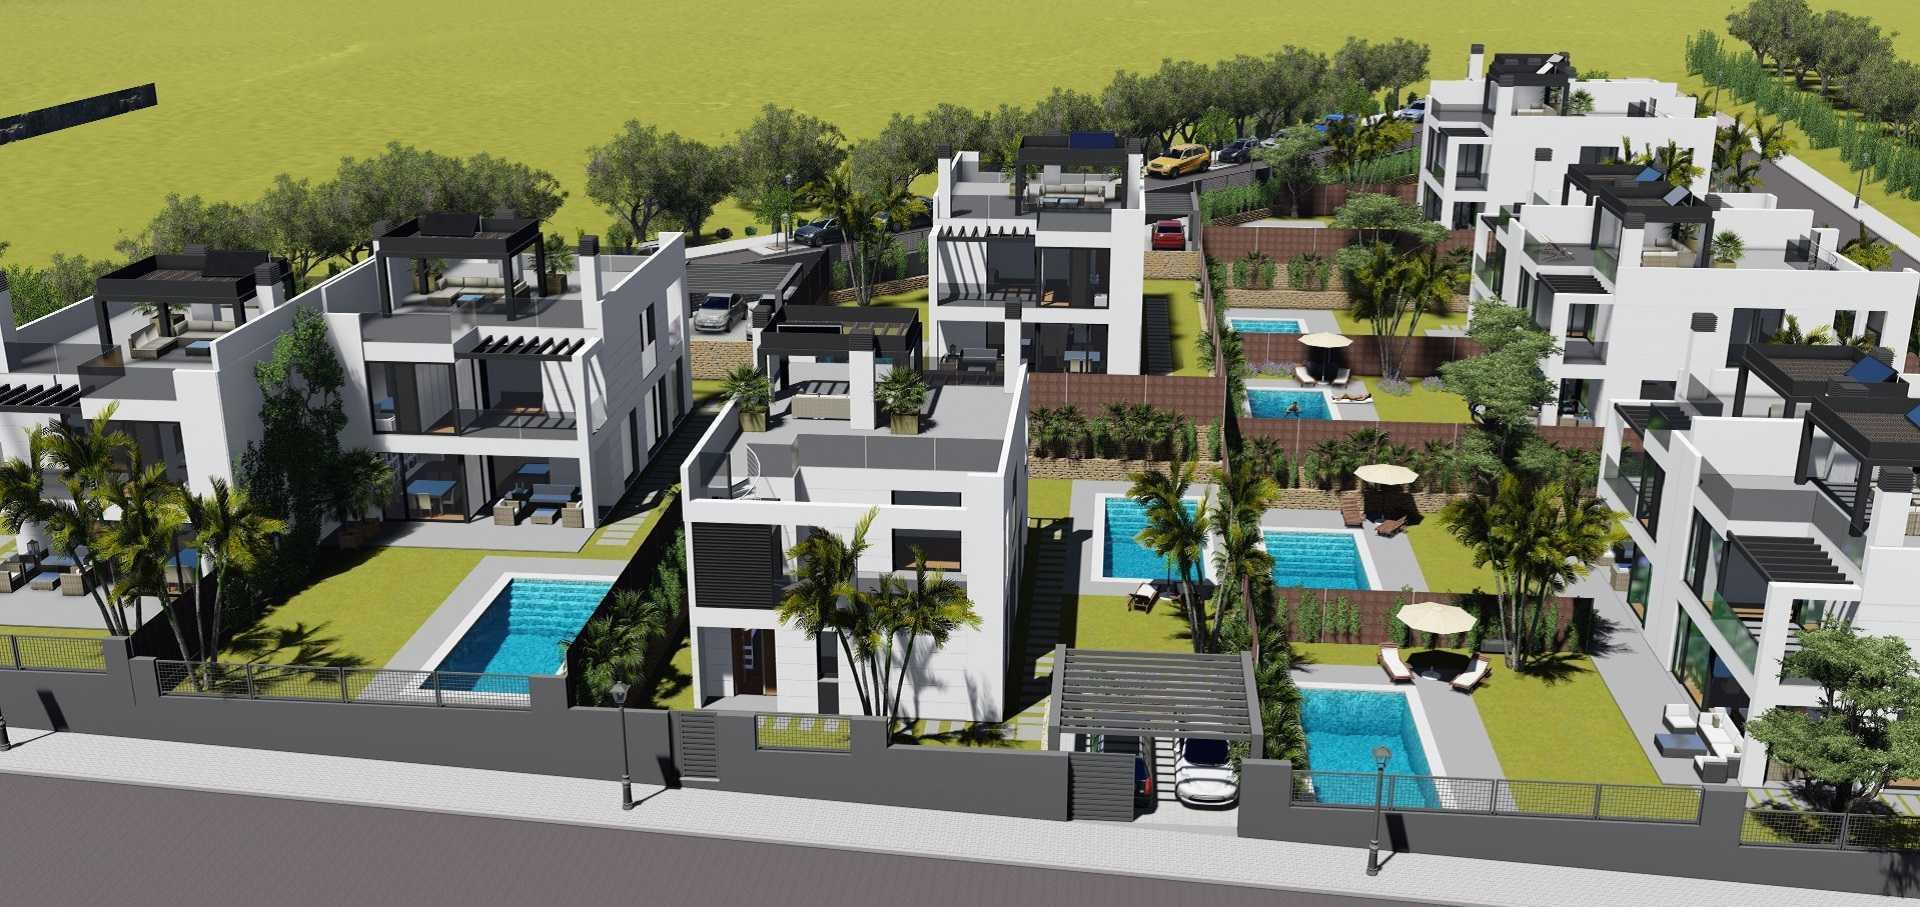 Proyectos de arquitectura viviendas unifamiliares Torrelodones